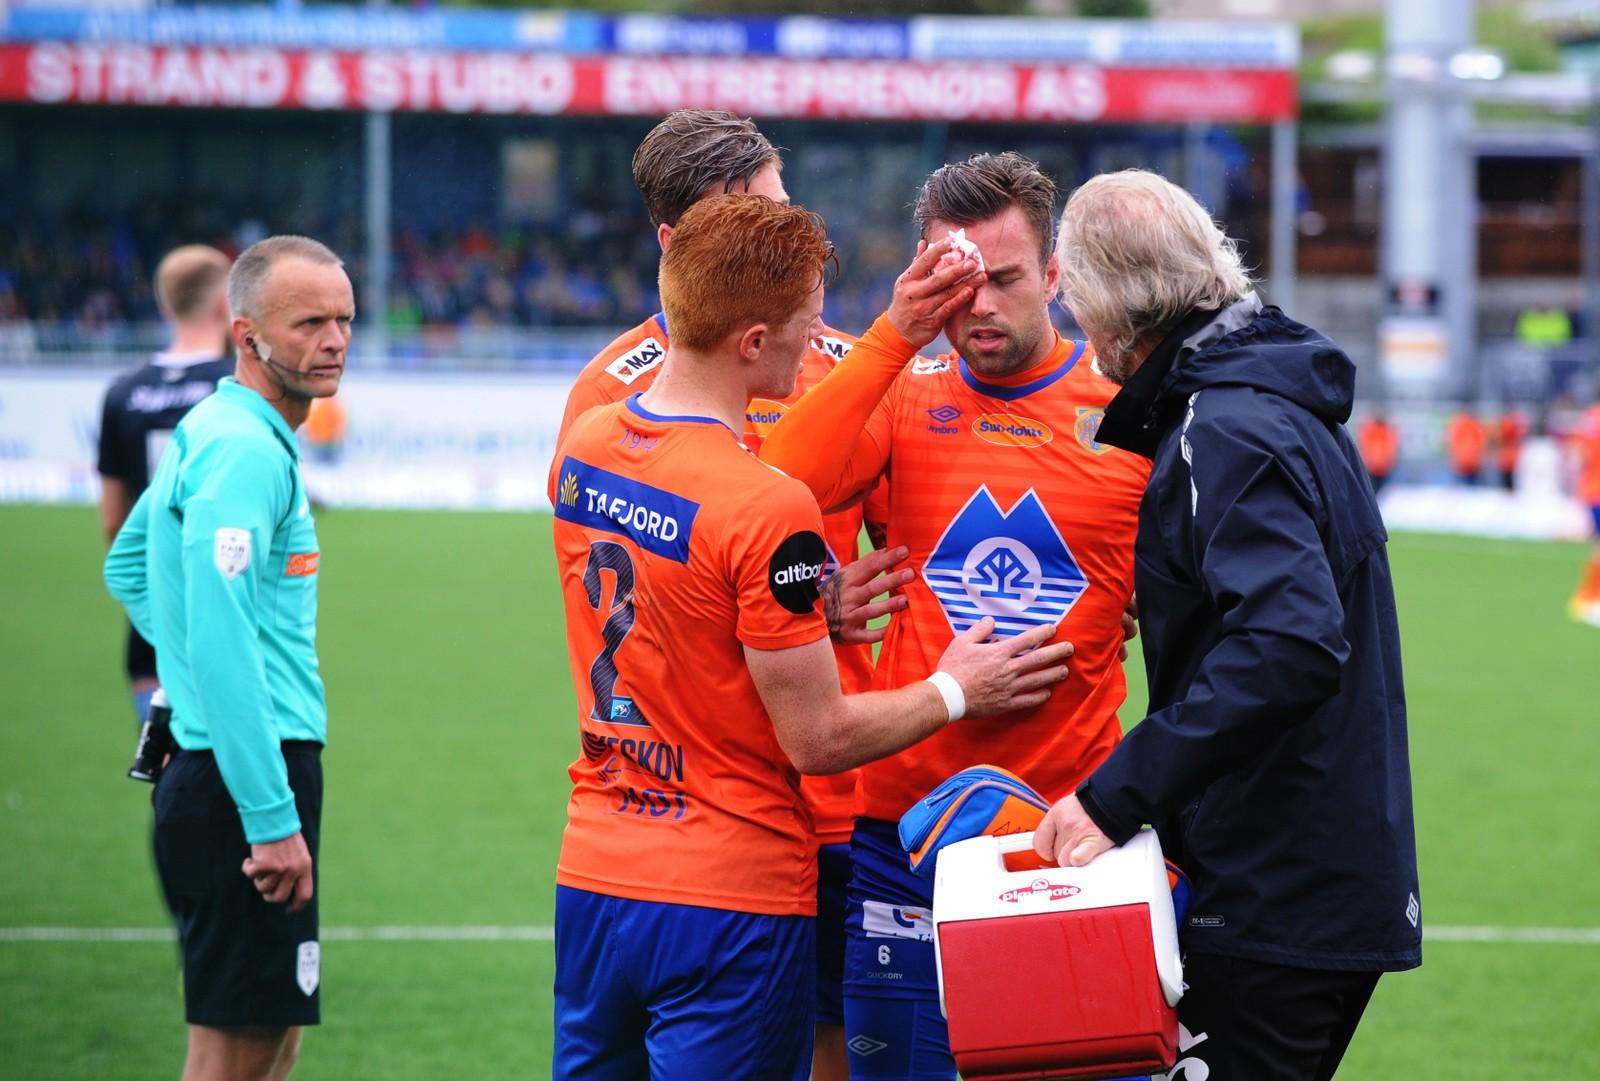 Aalesunds Kaj Ramsteijn ut med skade over øyet. Foto: Anders Tøsse / NTB scanpix Eliteserien fotball 2017 Kristiansund-Aalesund.